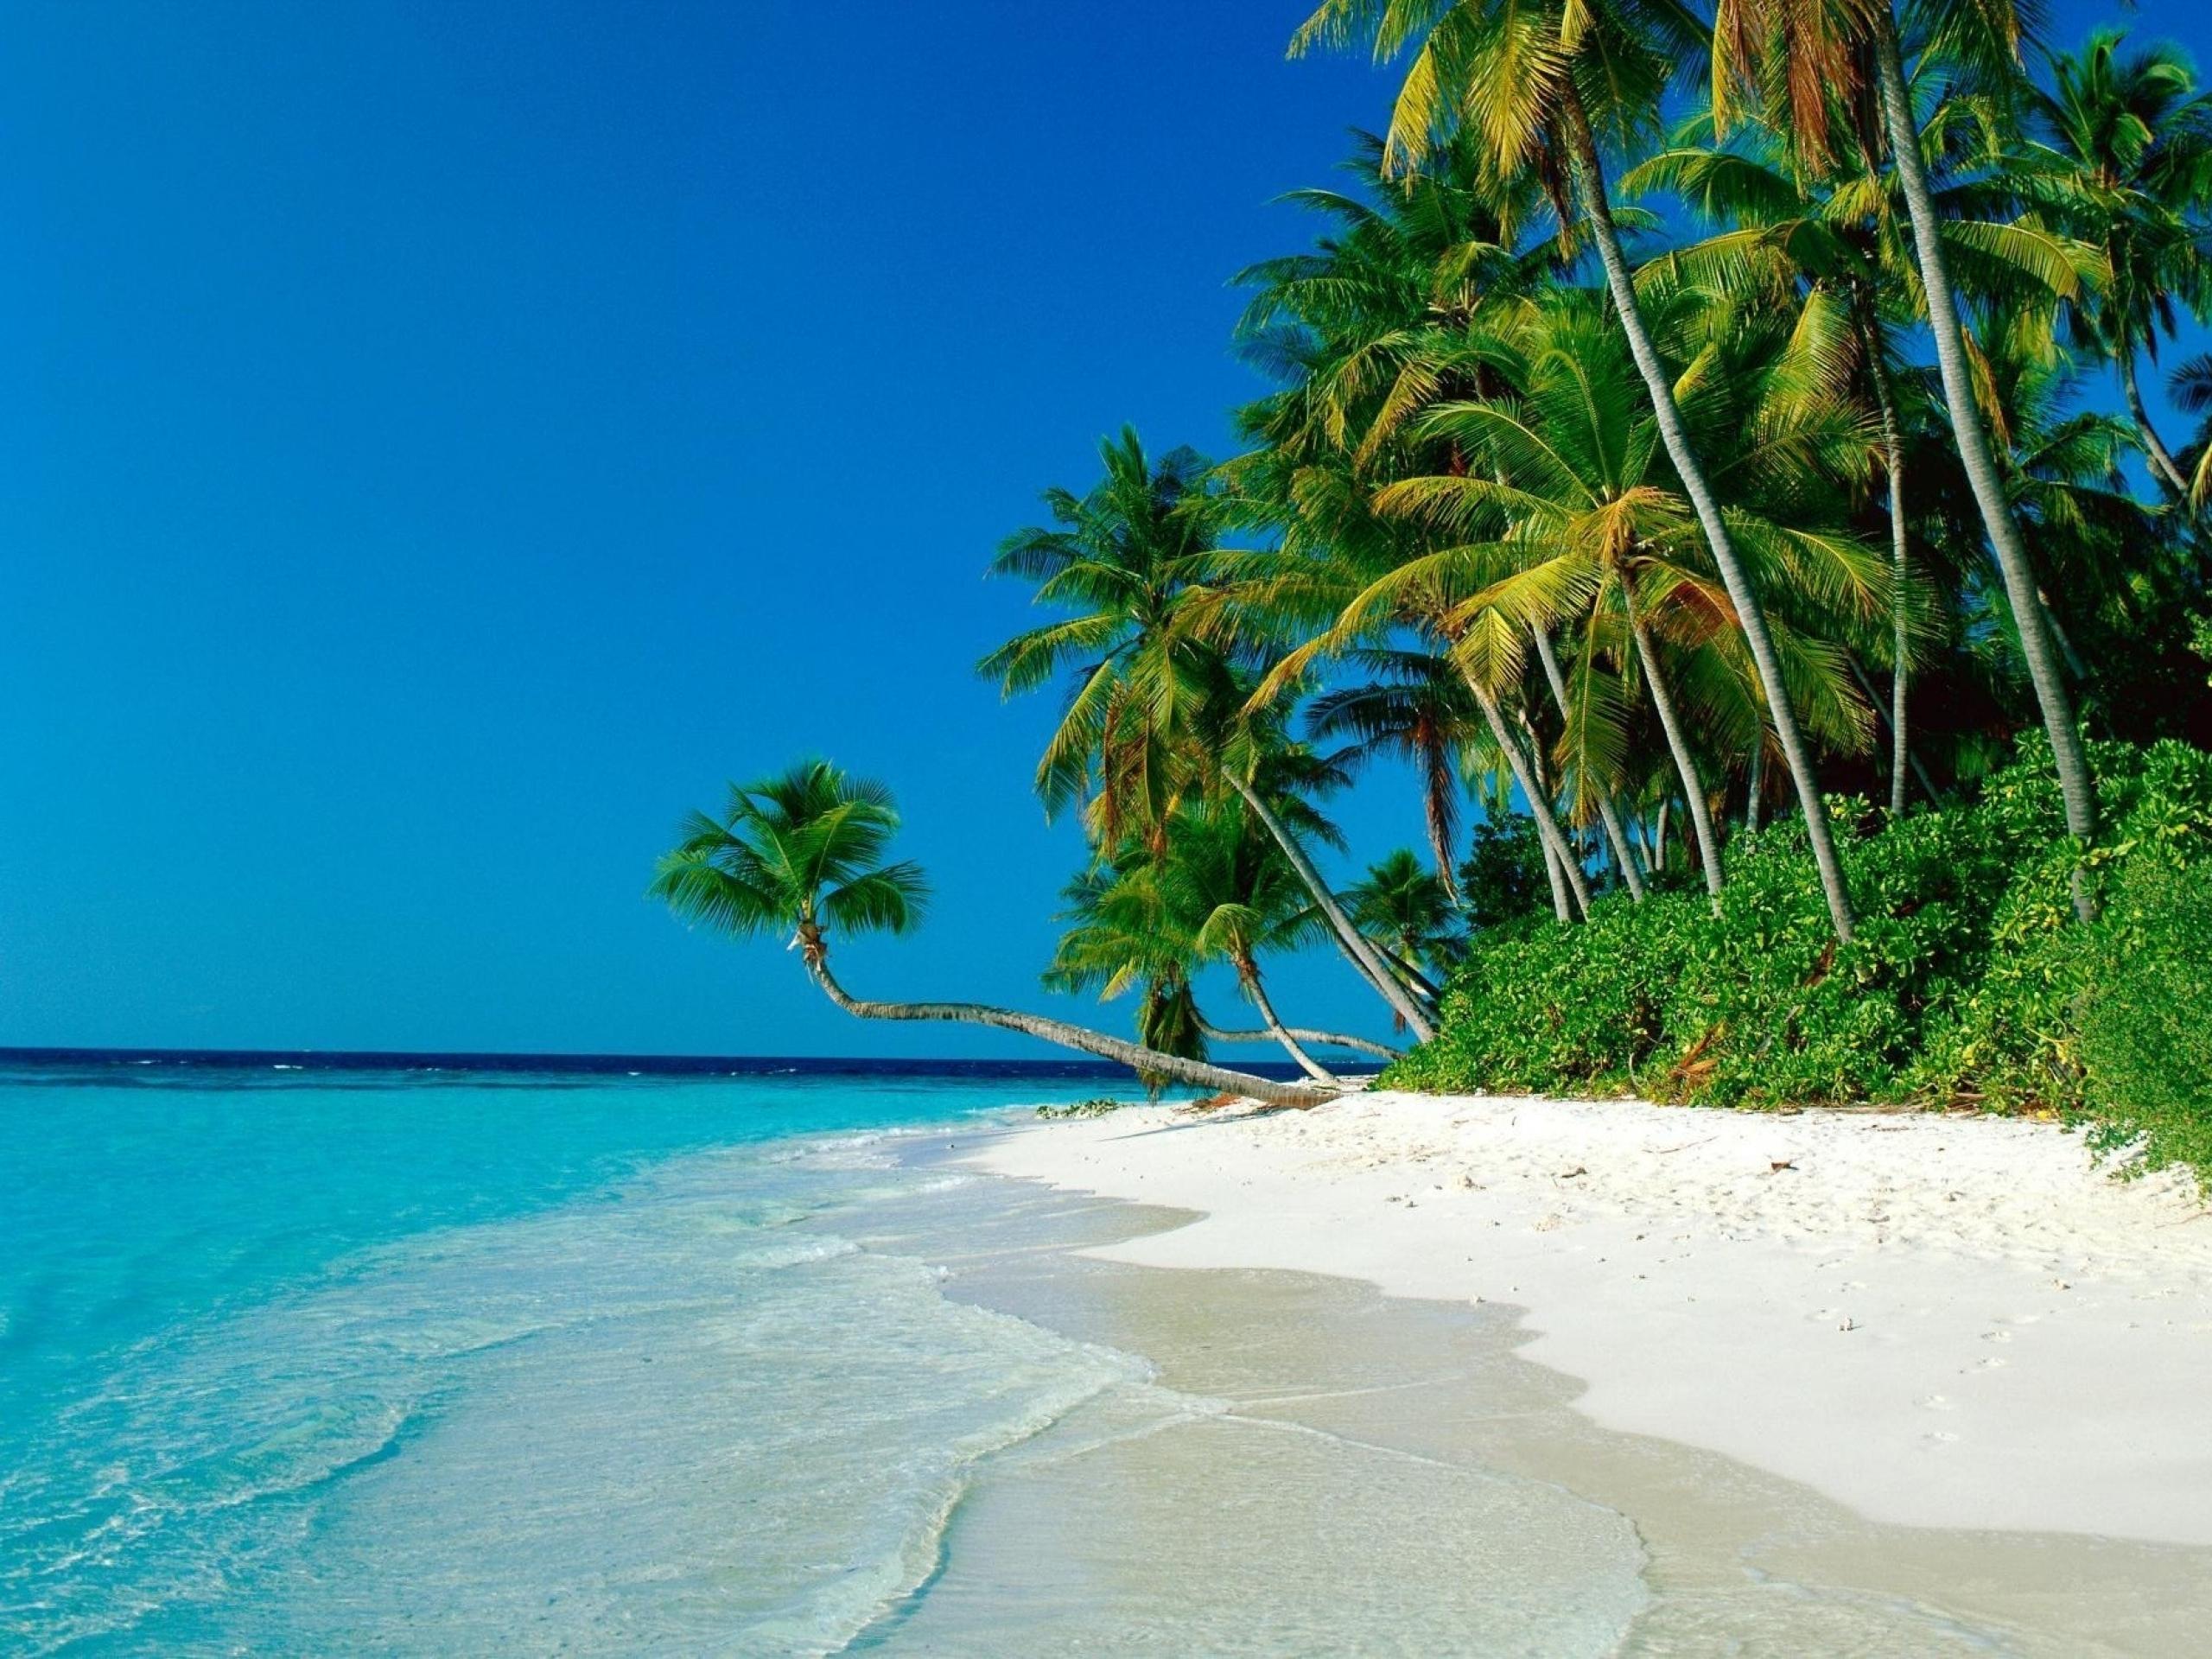 Ocean Palm Trees Shore Beach wallpapers Ocean Palm Trees Shore Beach 2560x1920